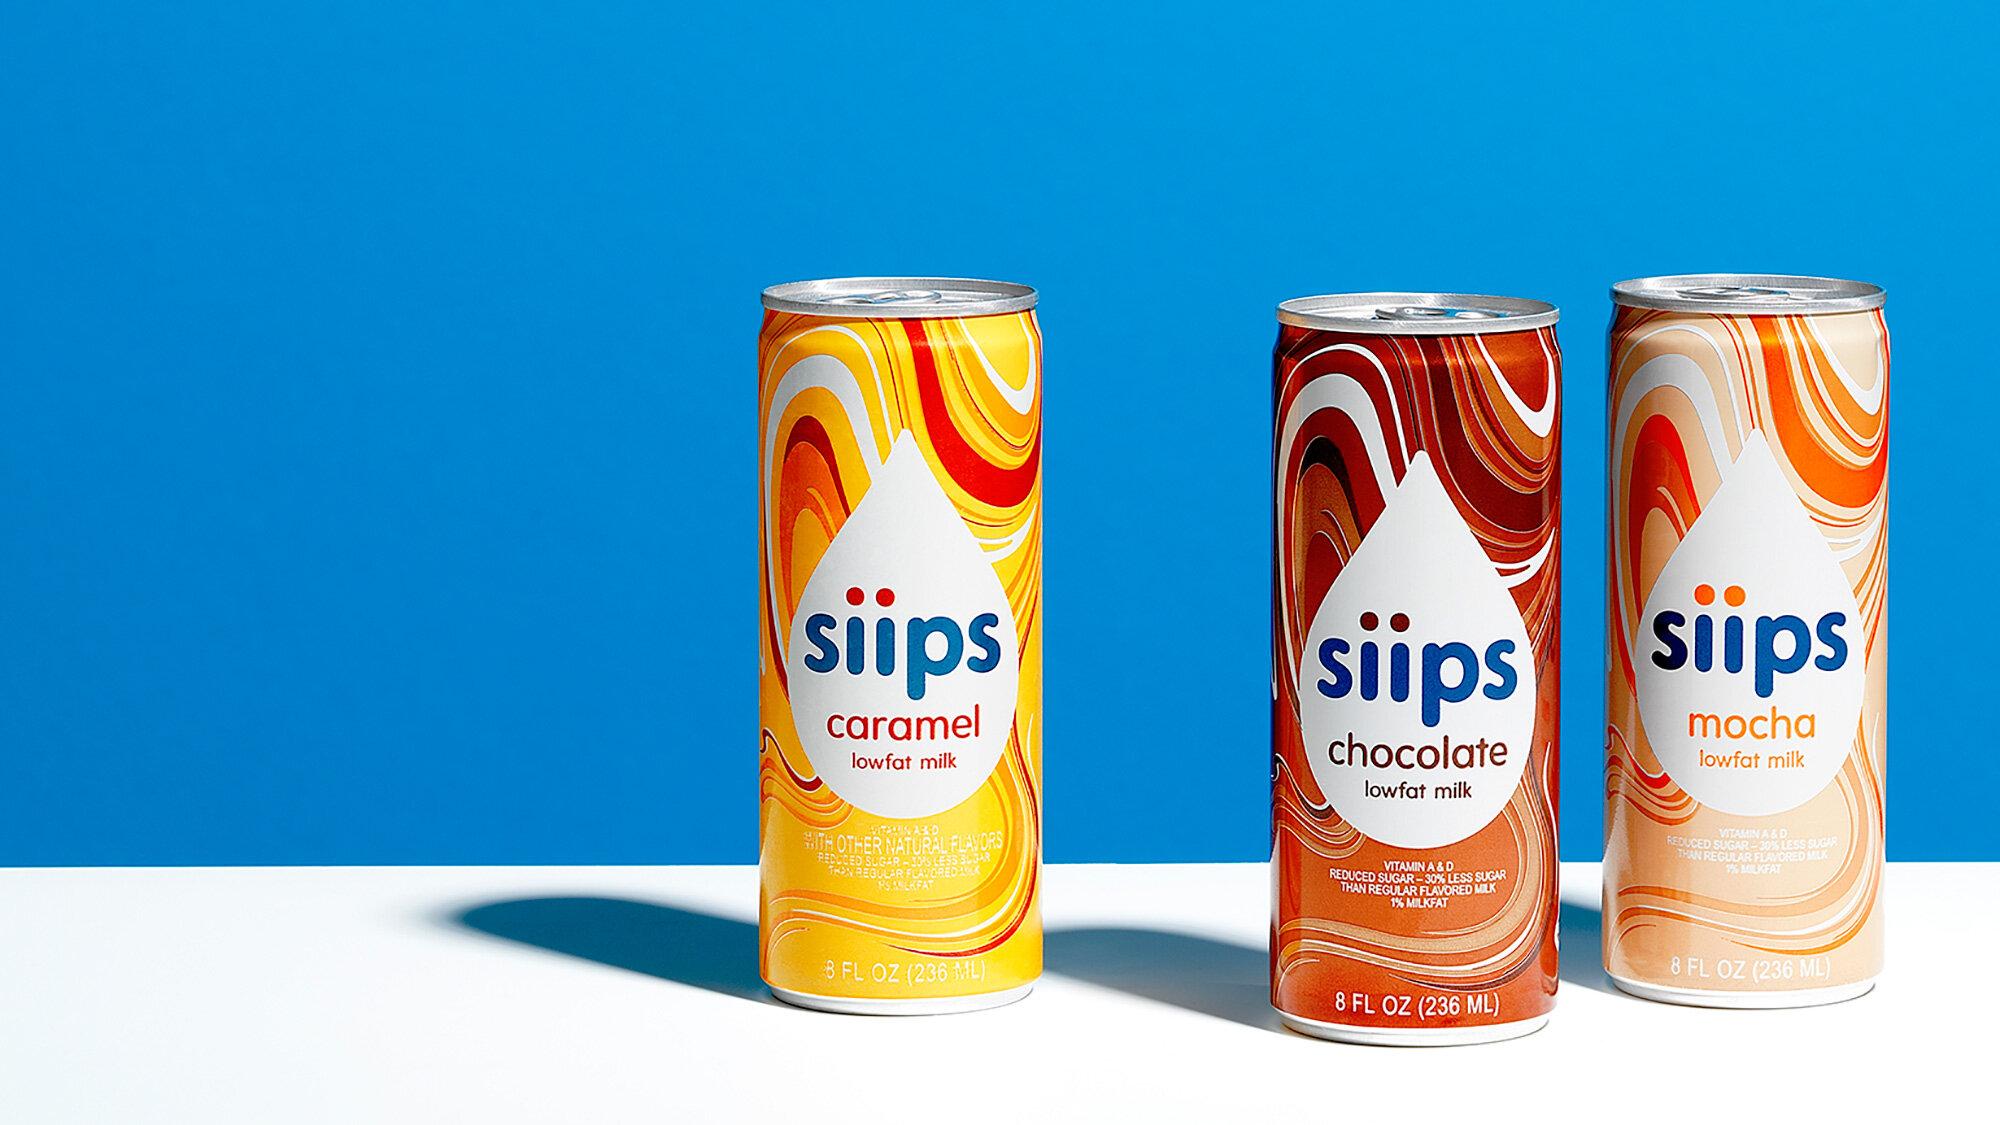 Siips Caramel Lowfat Milk 低脂牛奶包装设计